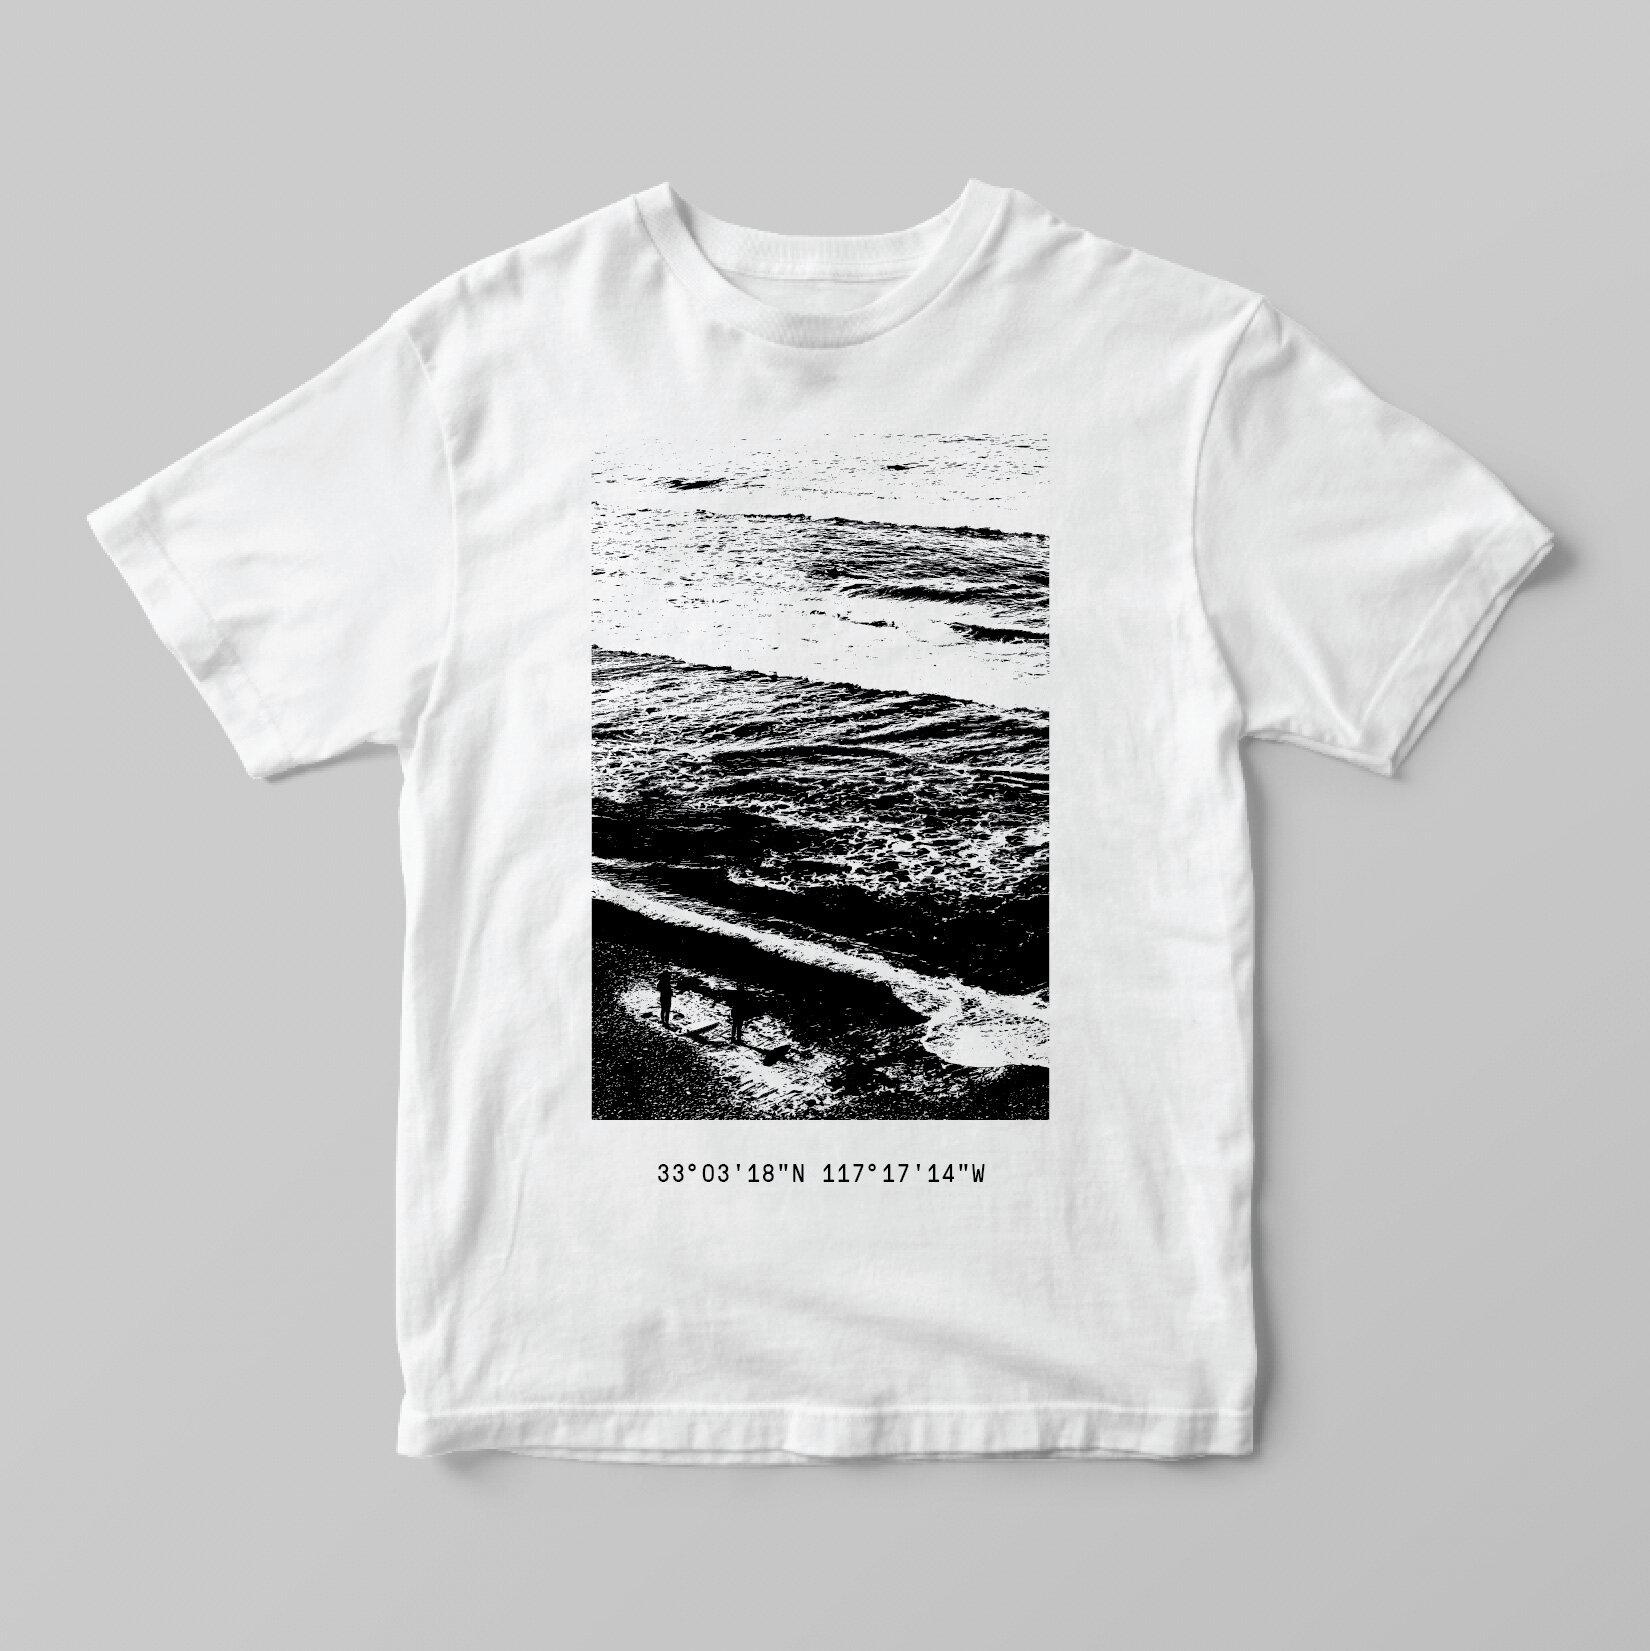 Tee shirt concept design (reject) | Annie Szafranski, 2019